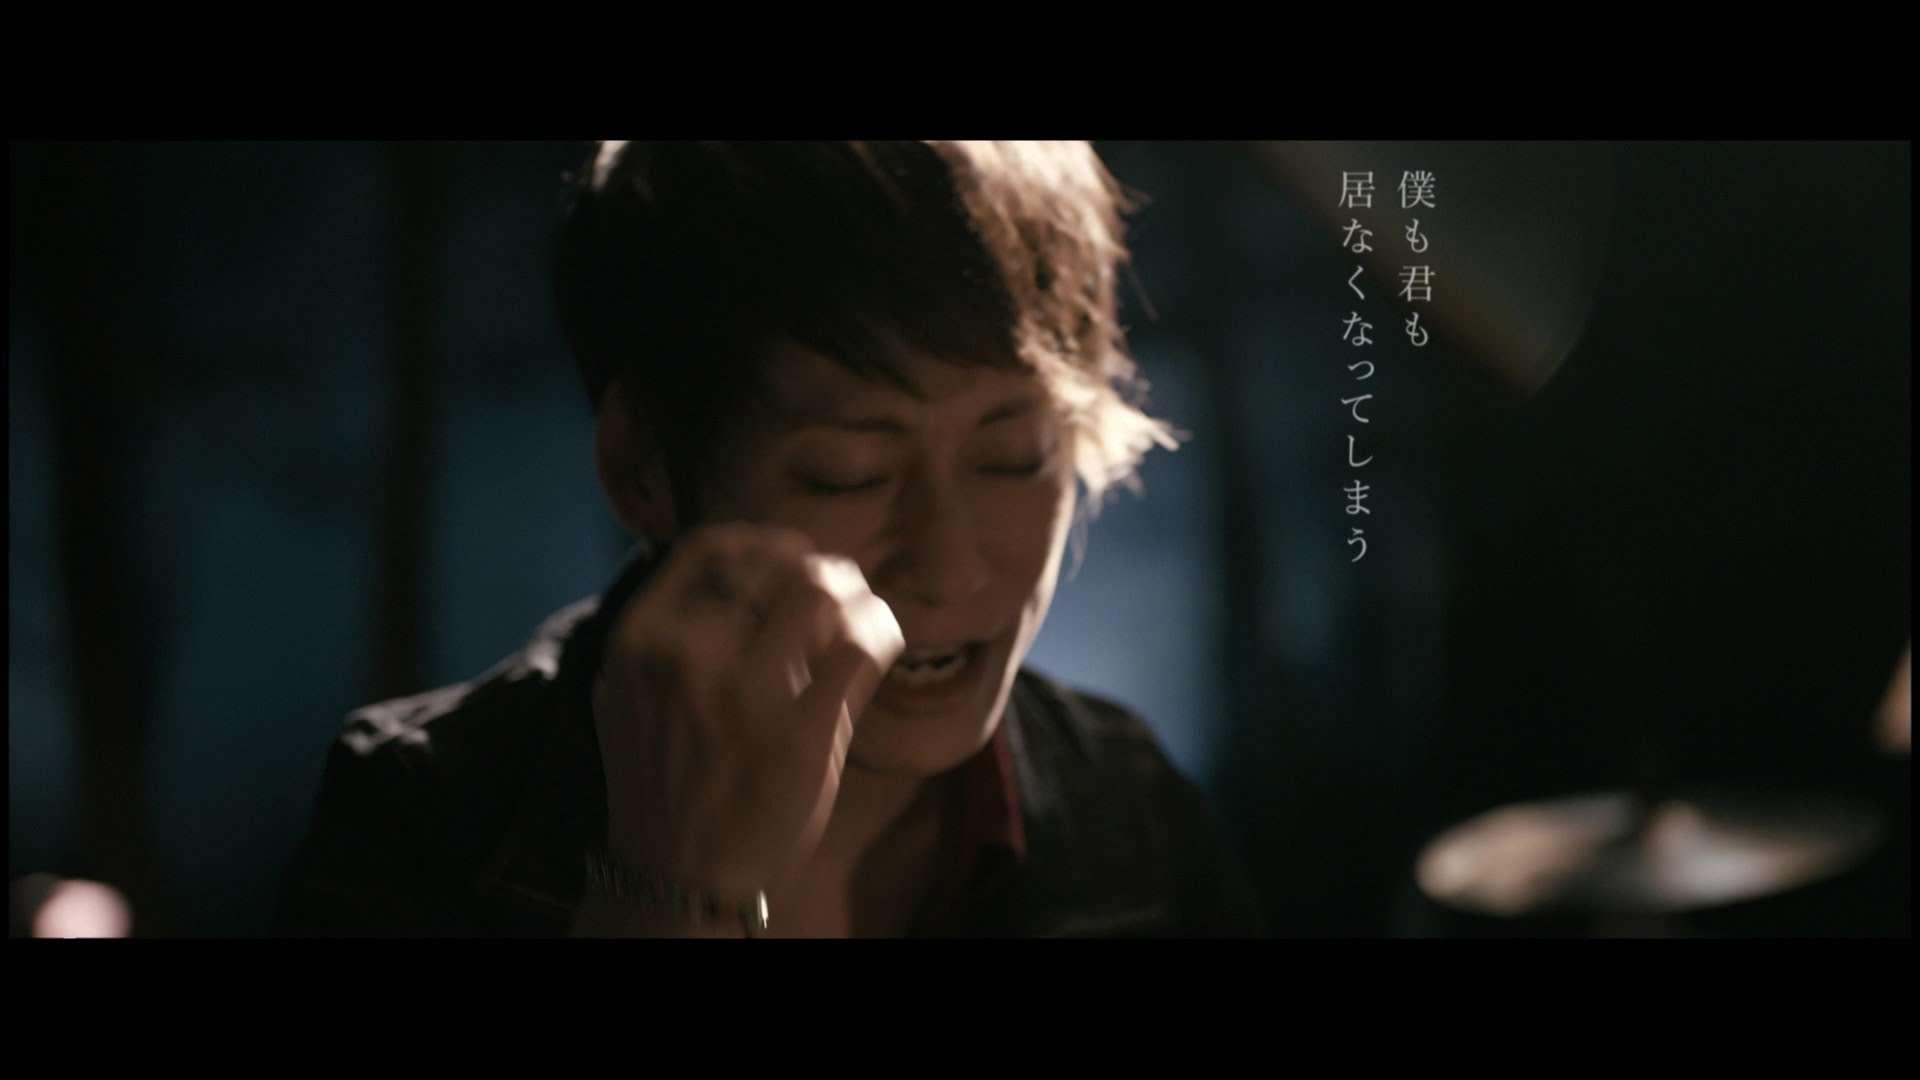 UVERworld 『7日目の決意 vol.02』 - YouTube